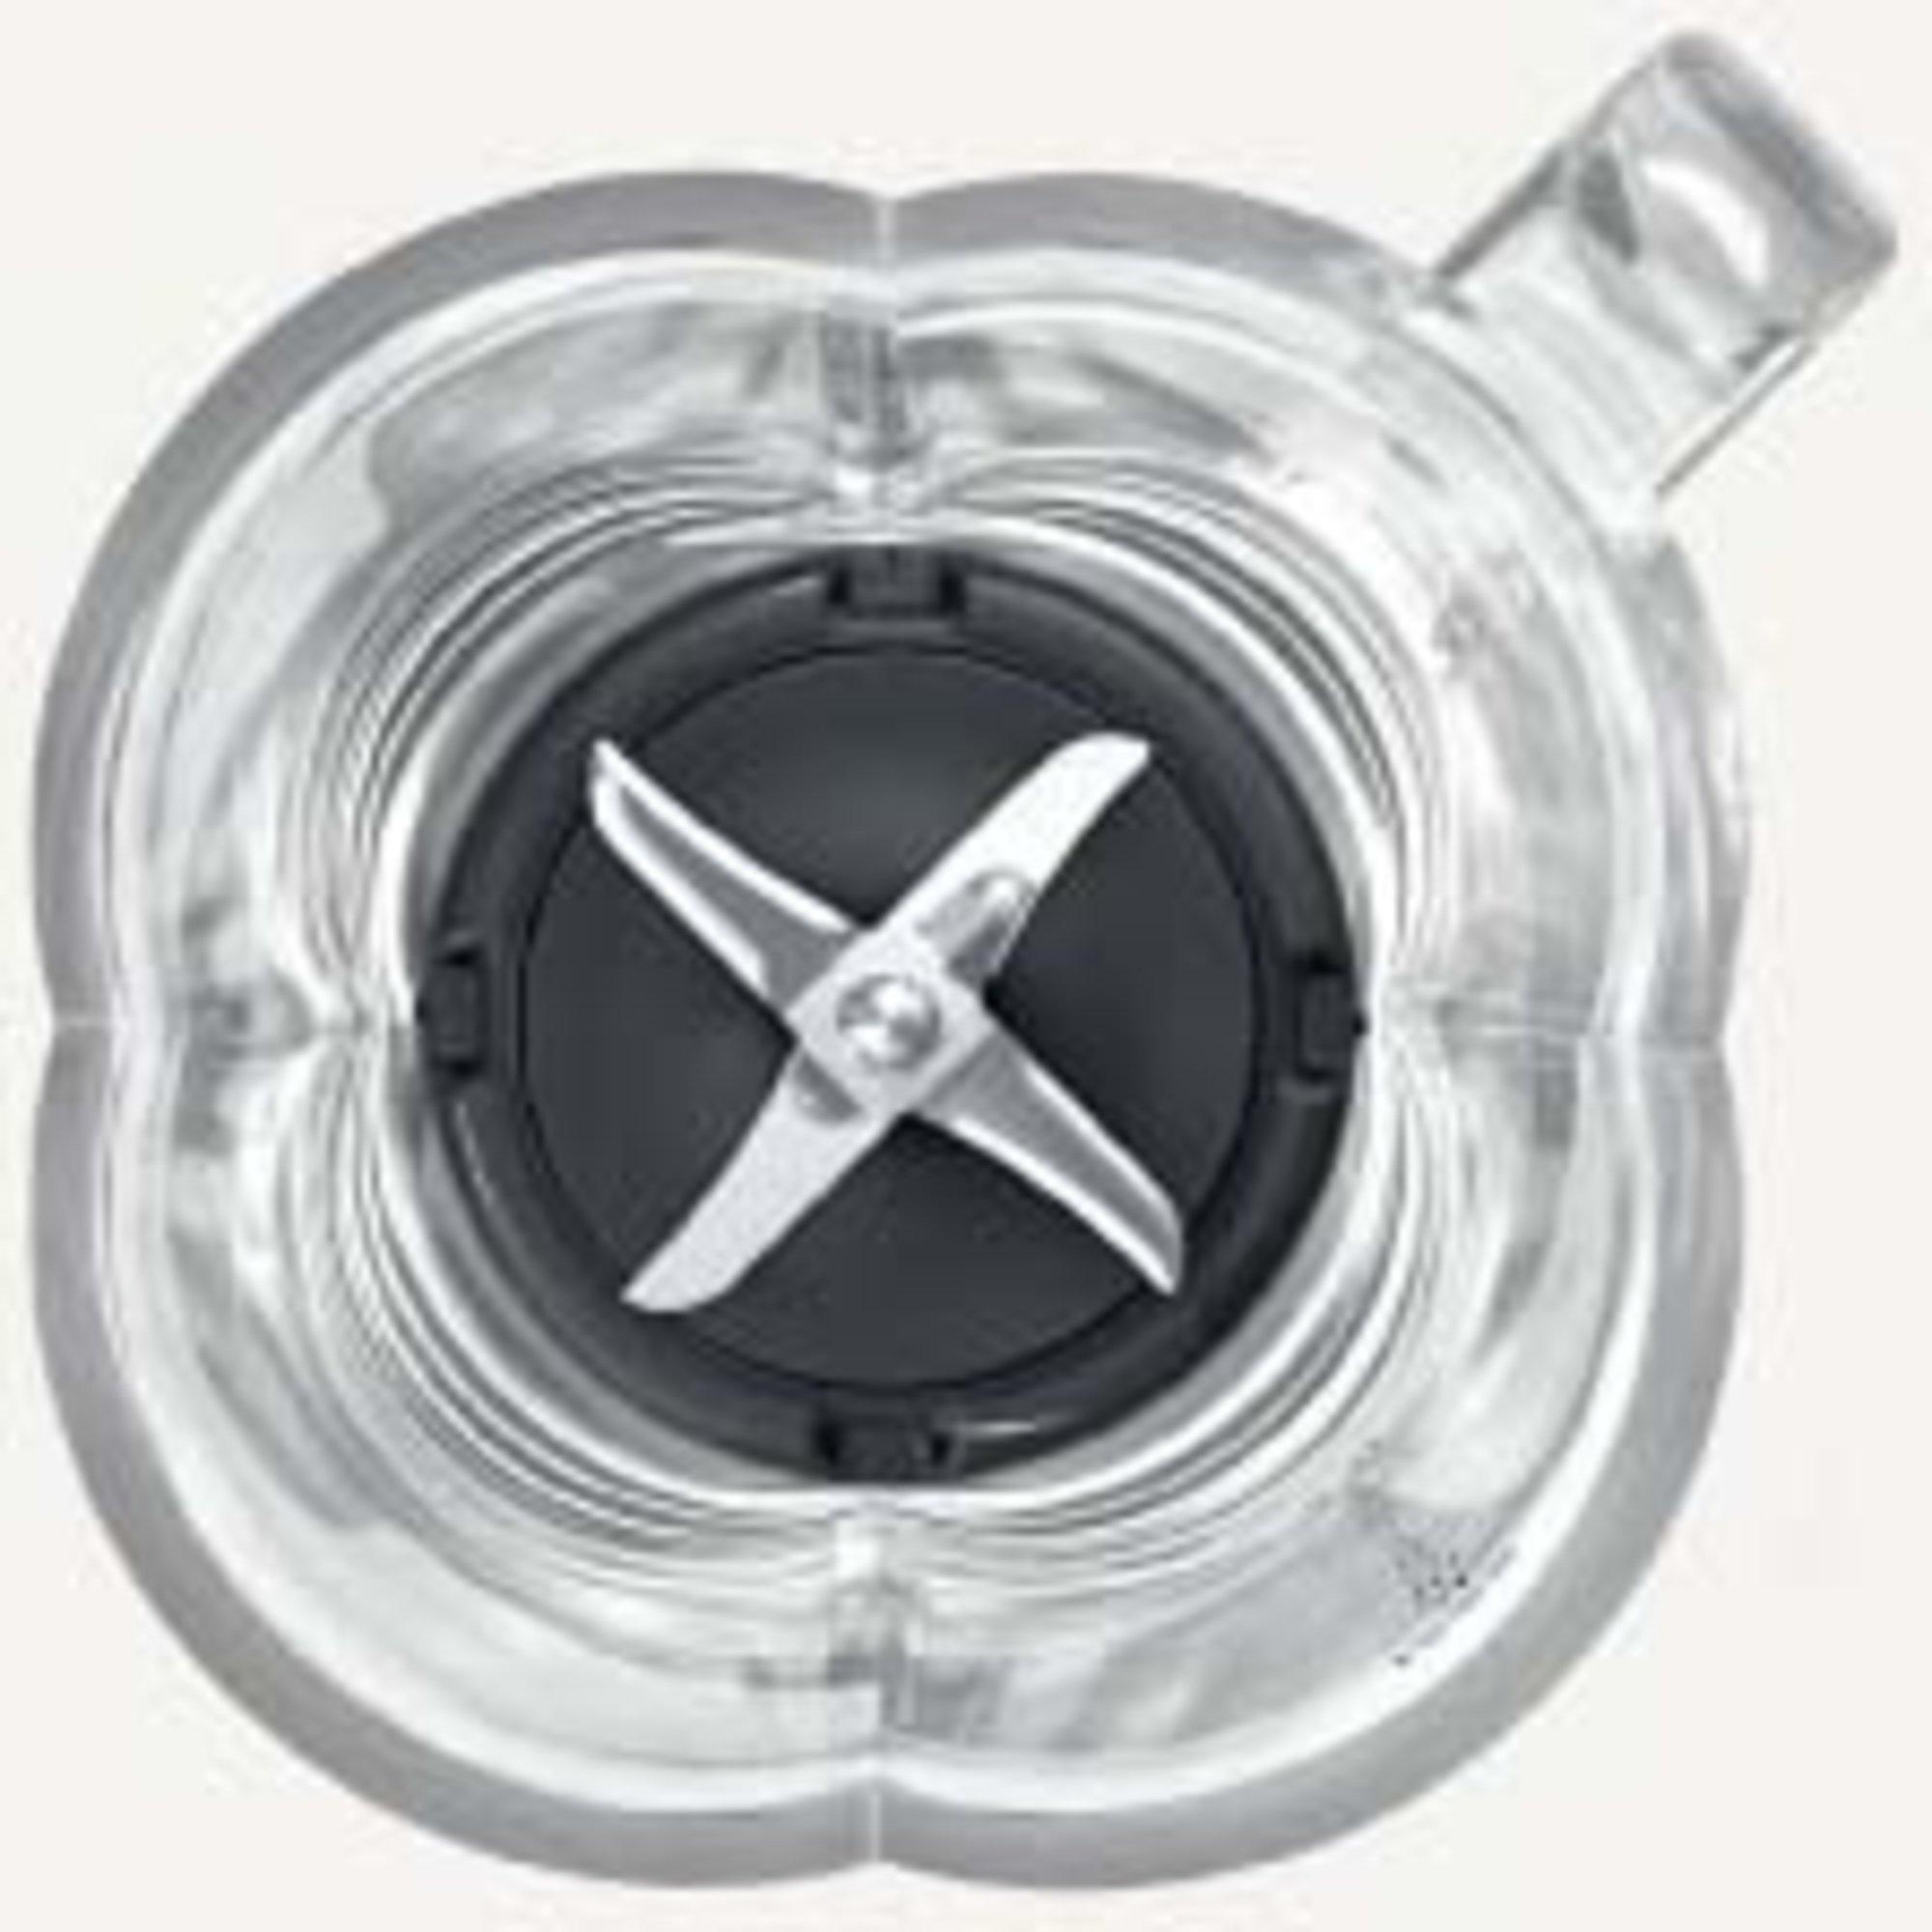 Turmix Blender 1.2L